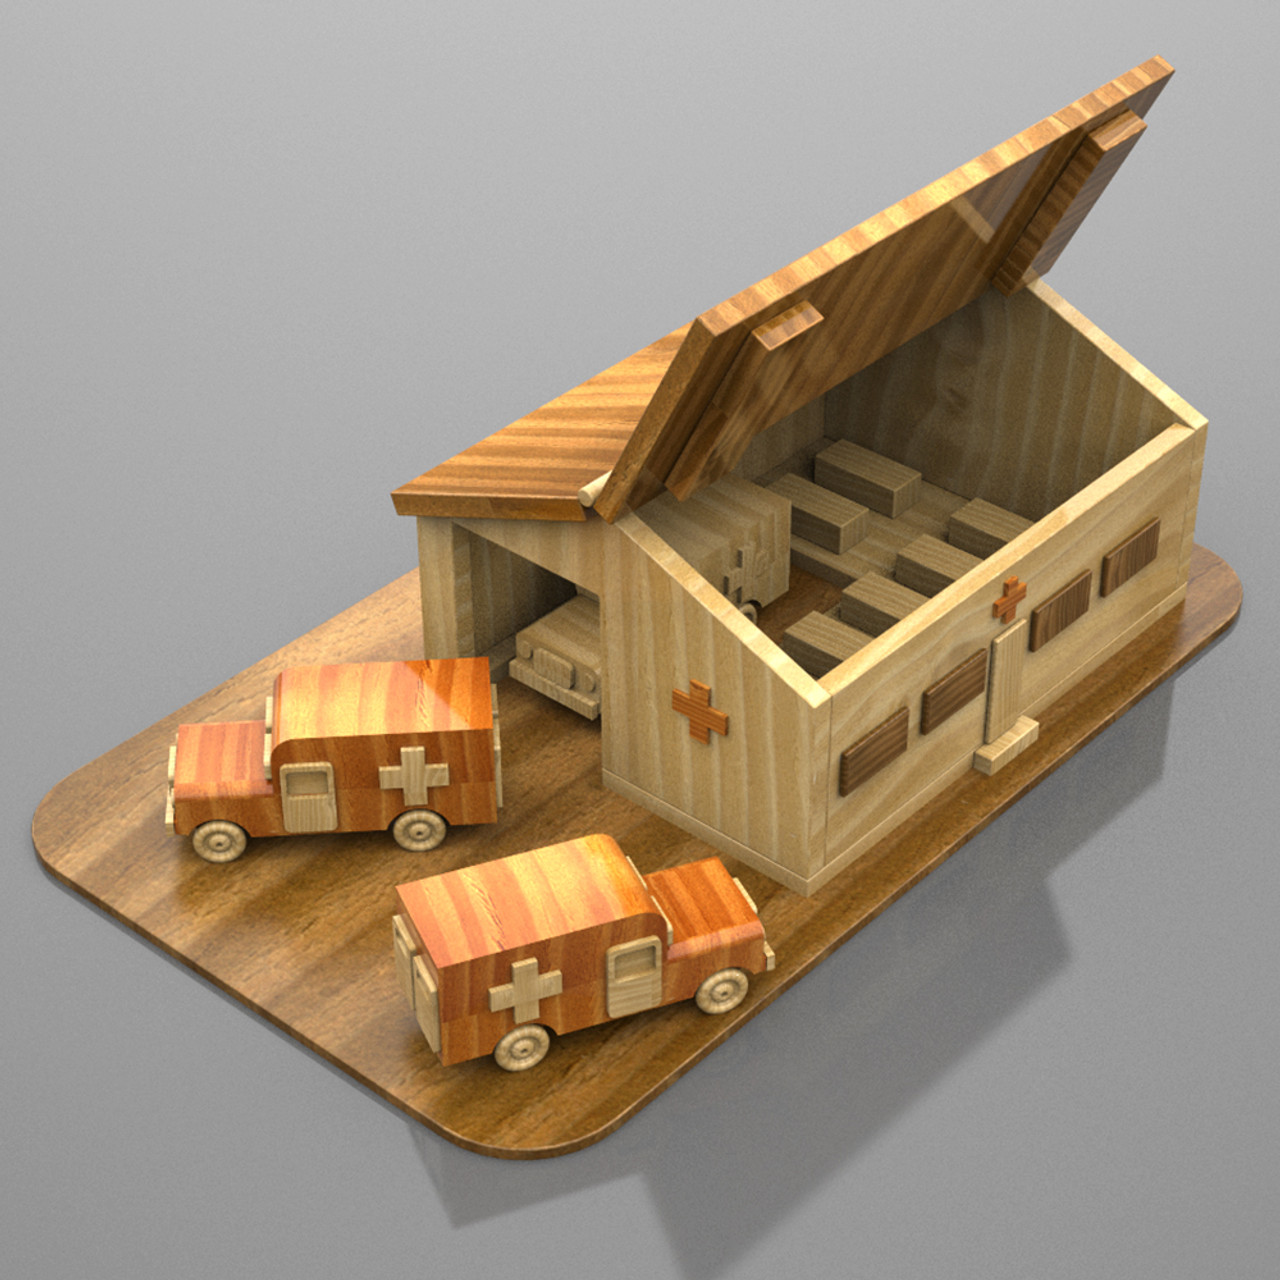 military miniatures vietnam field hospital wood toy plans (pdf download)